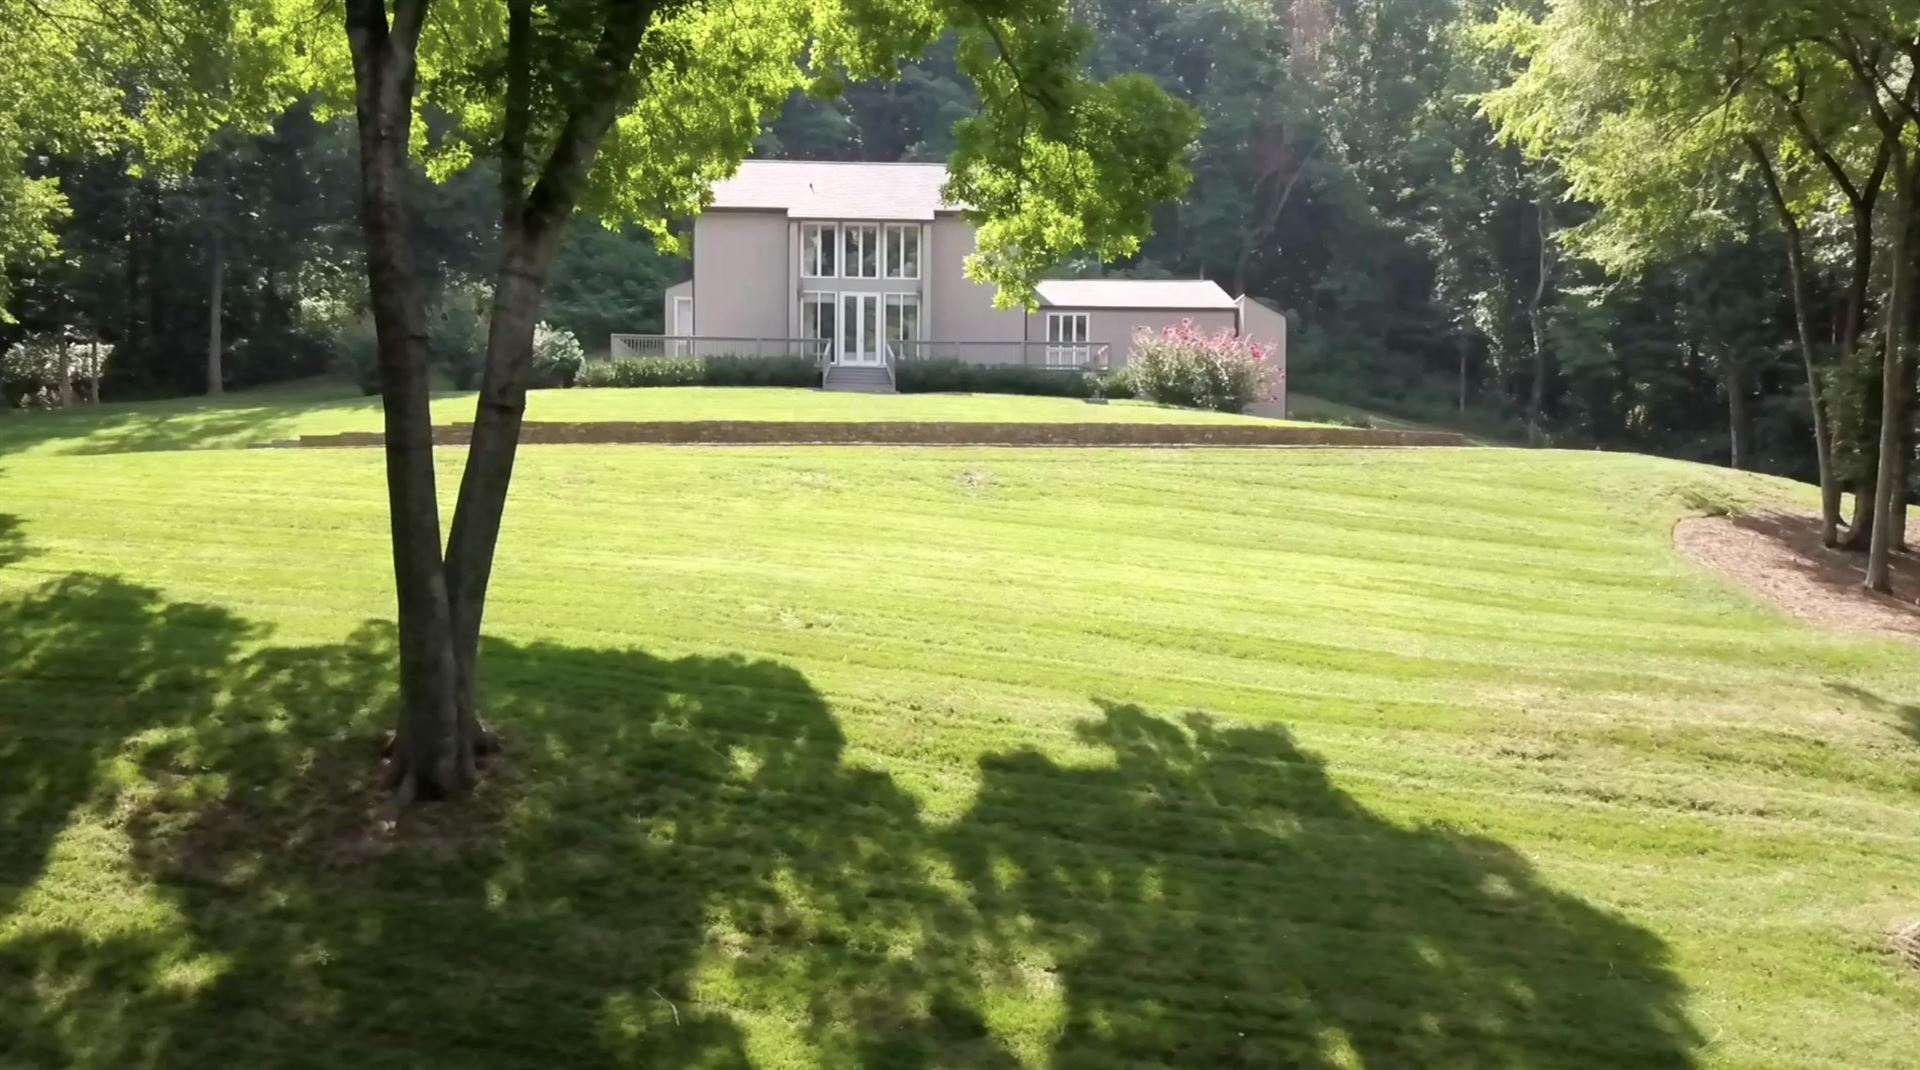 Photo of 4370 Chickering Ln, Nashville, TN 37215 (MLS # 2280306)